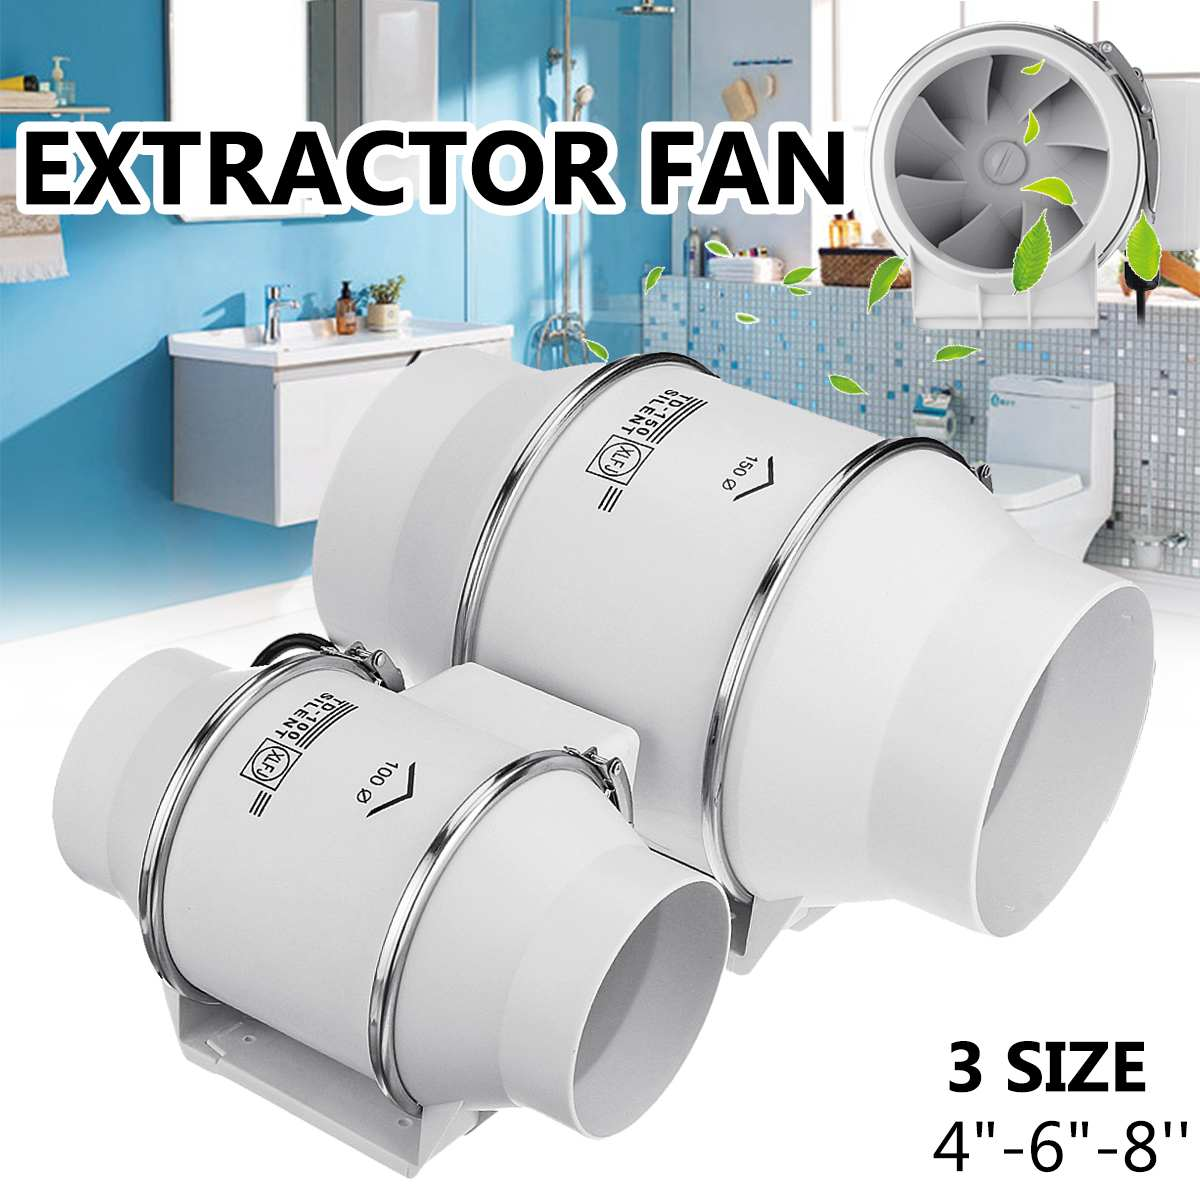 Wall-Extractor Ventilation-Fan Air-Blower Bedroom Exhaust Kitchen Silent 4/6/8inch-fan